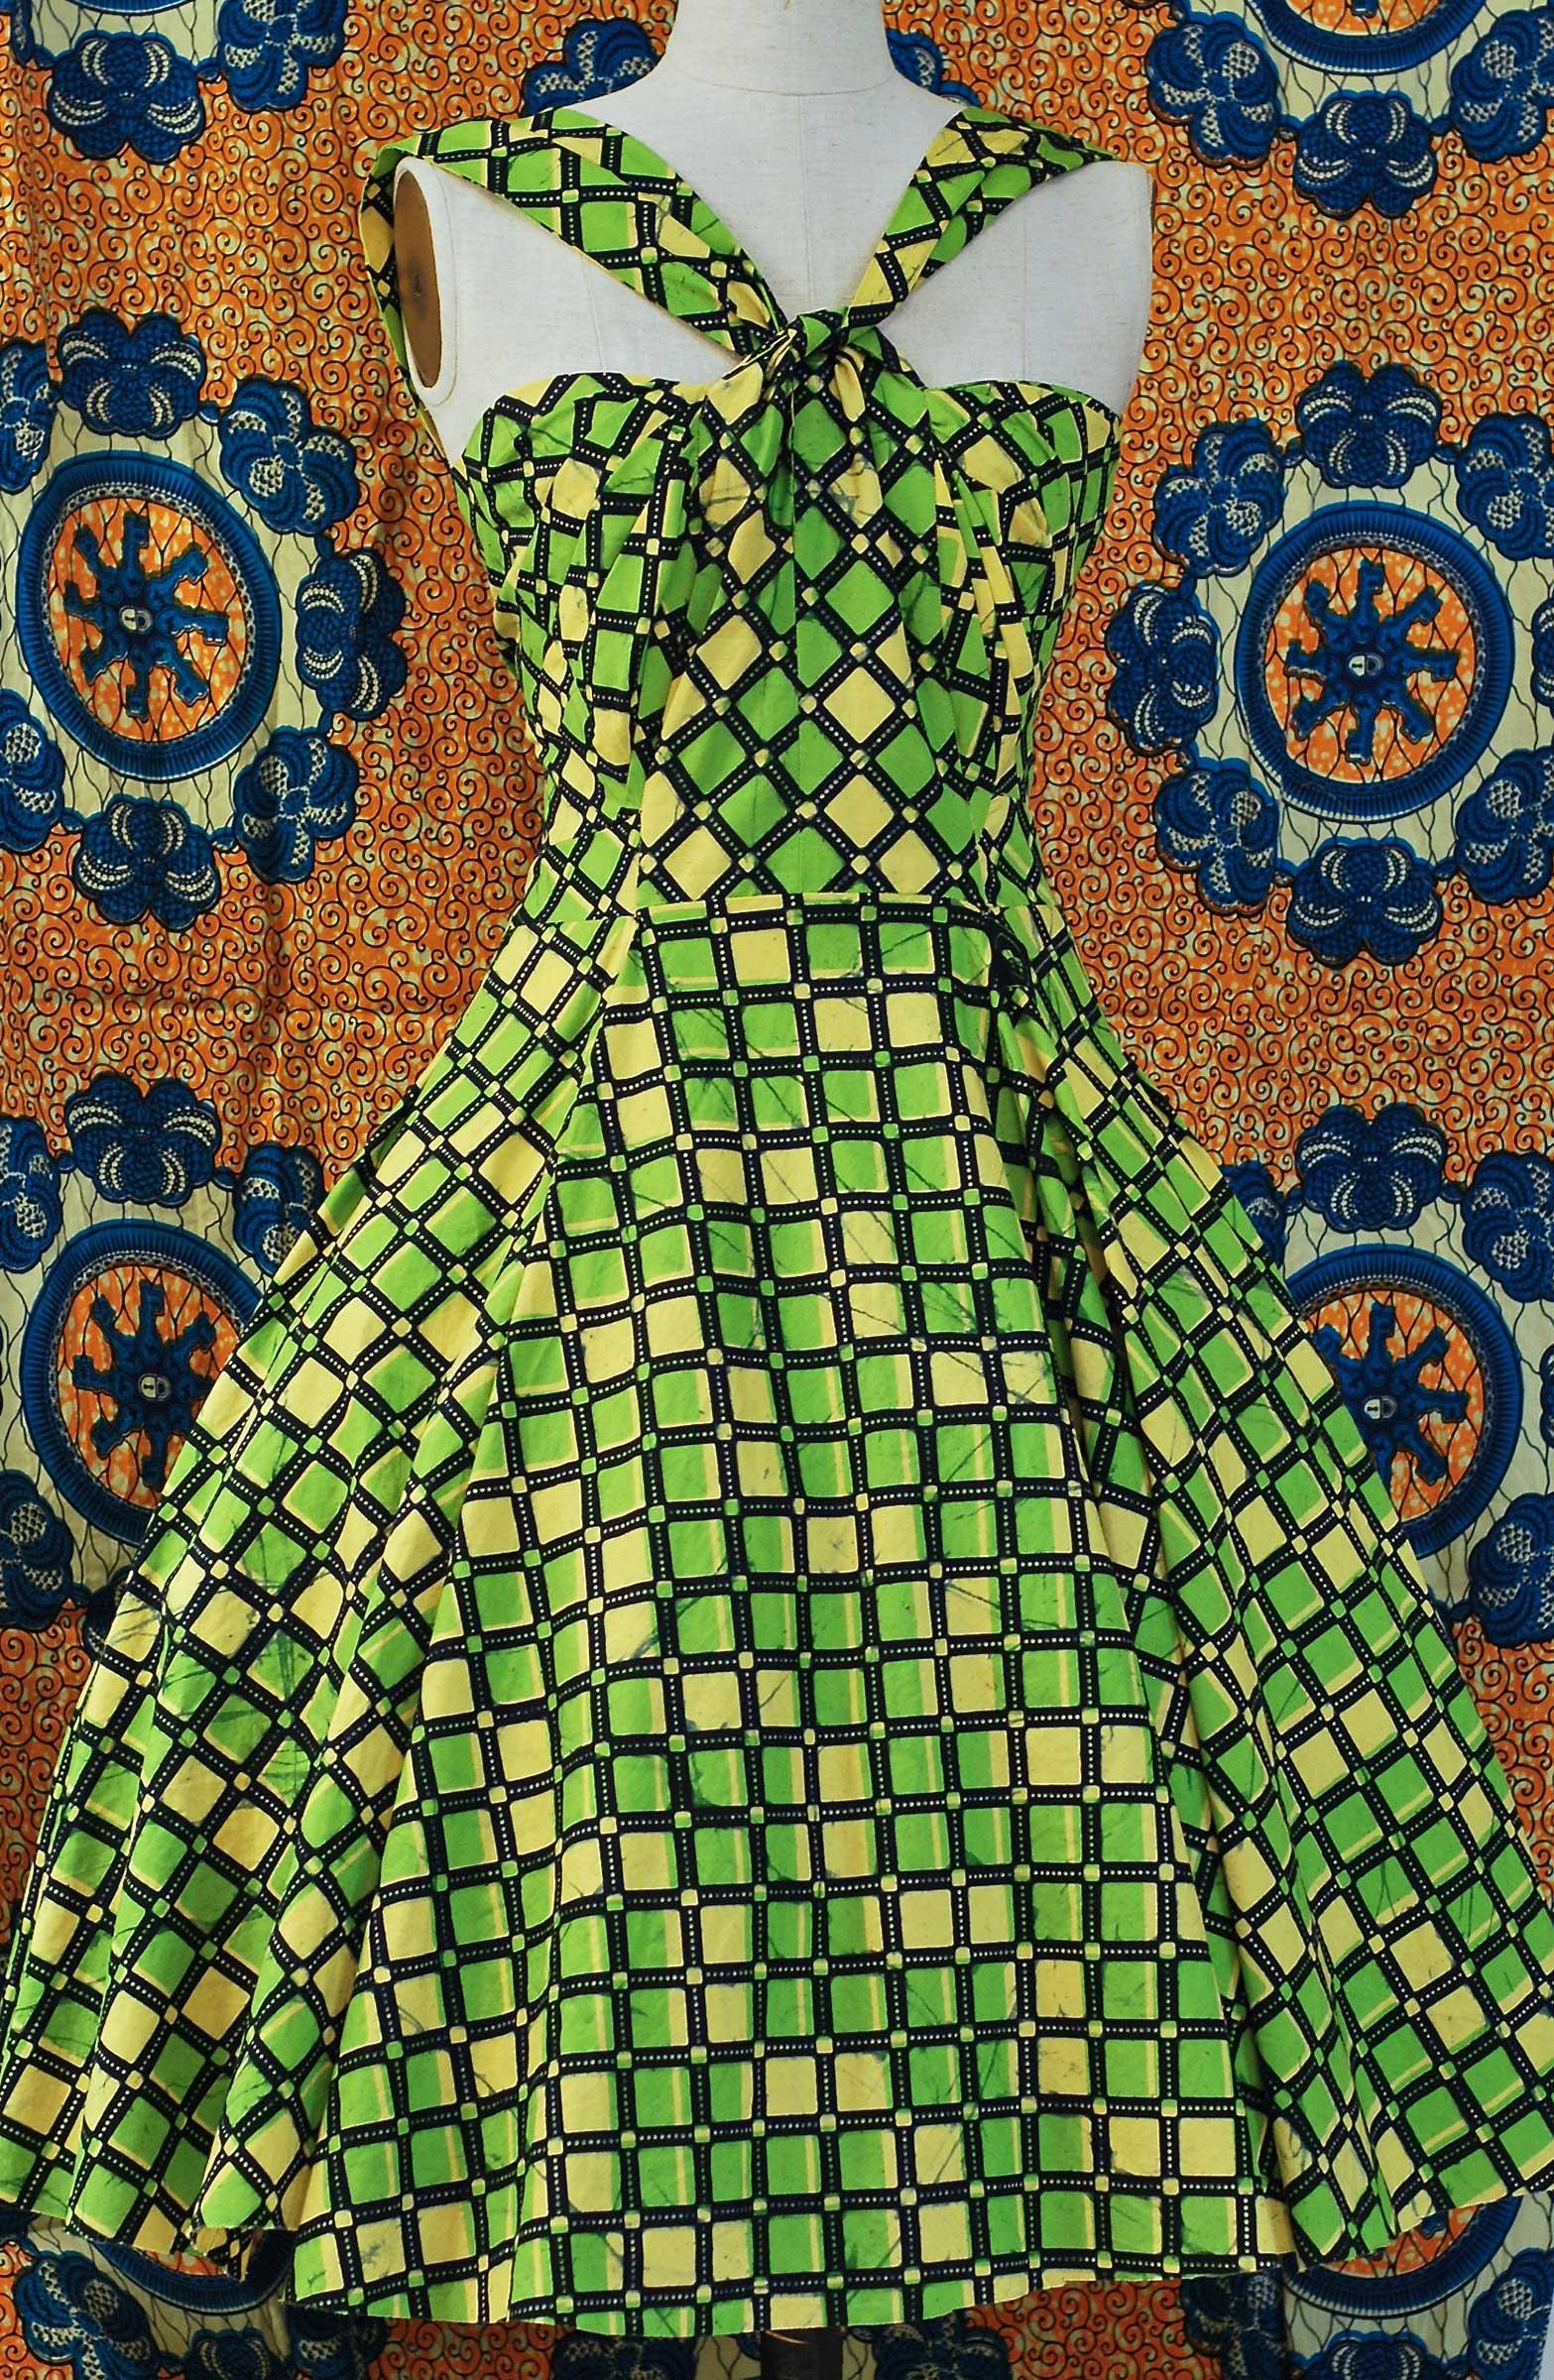 green-yellow-chelck-halter-dress.jpg